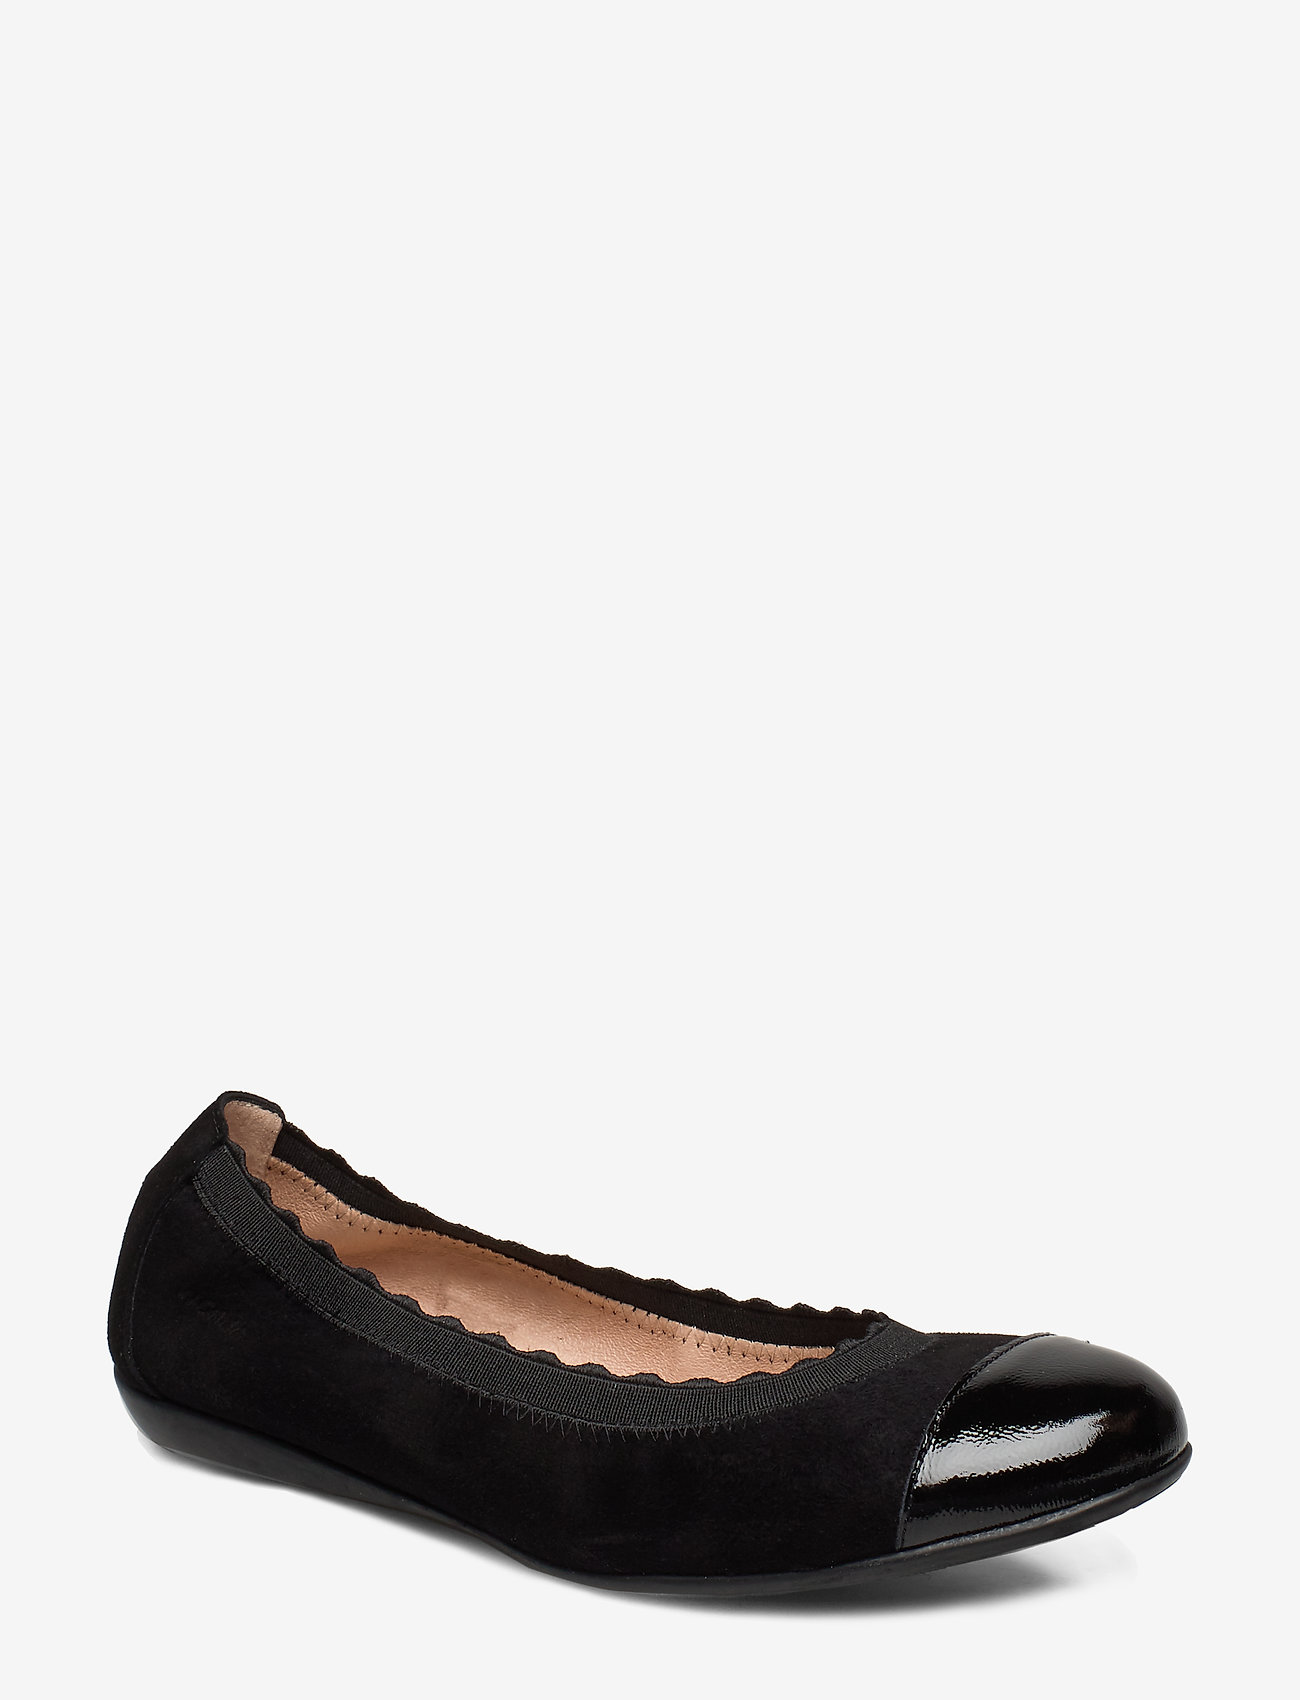 Wonders - A-6170 - loafers - black - 0